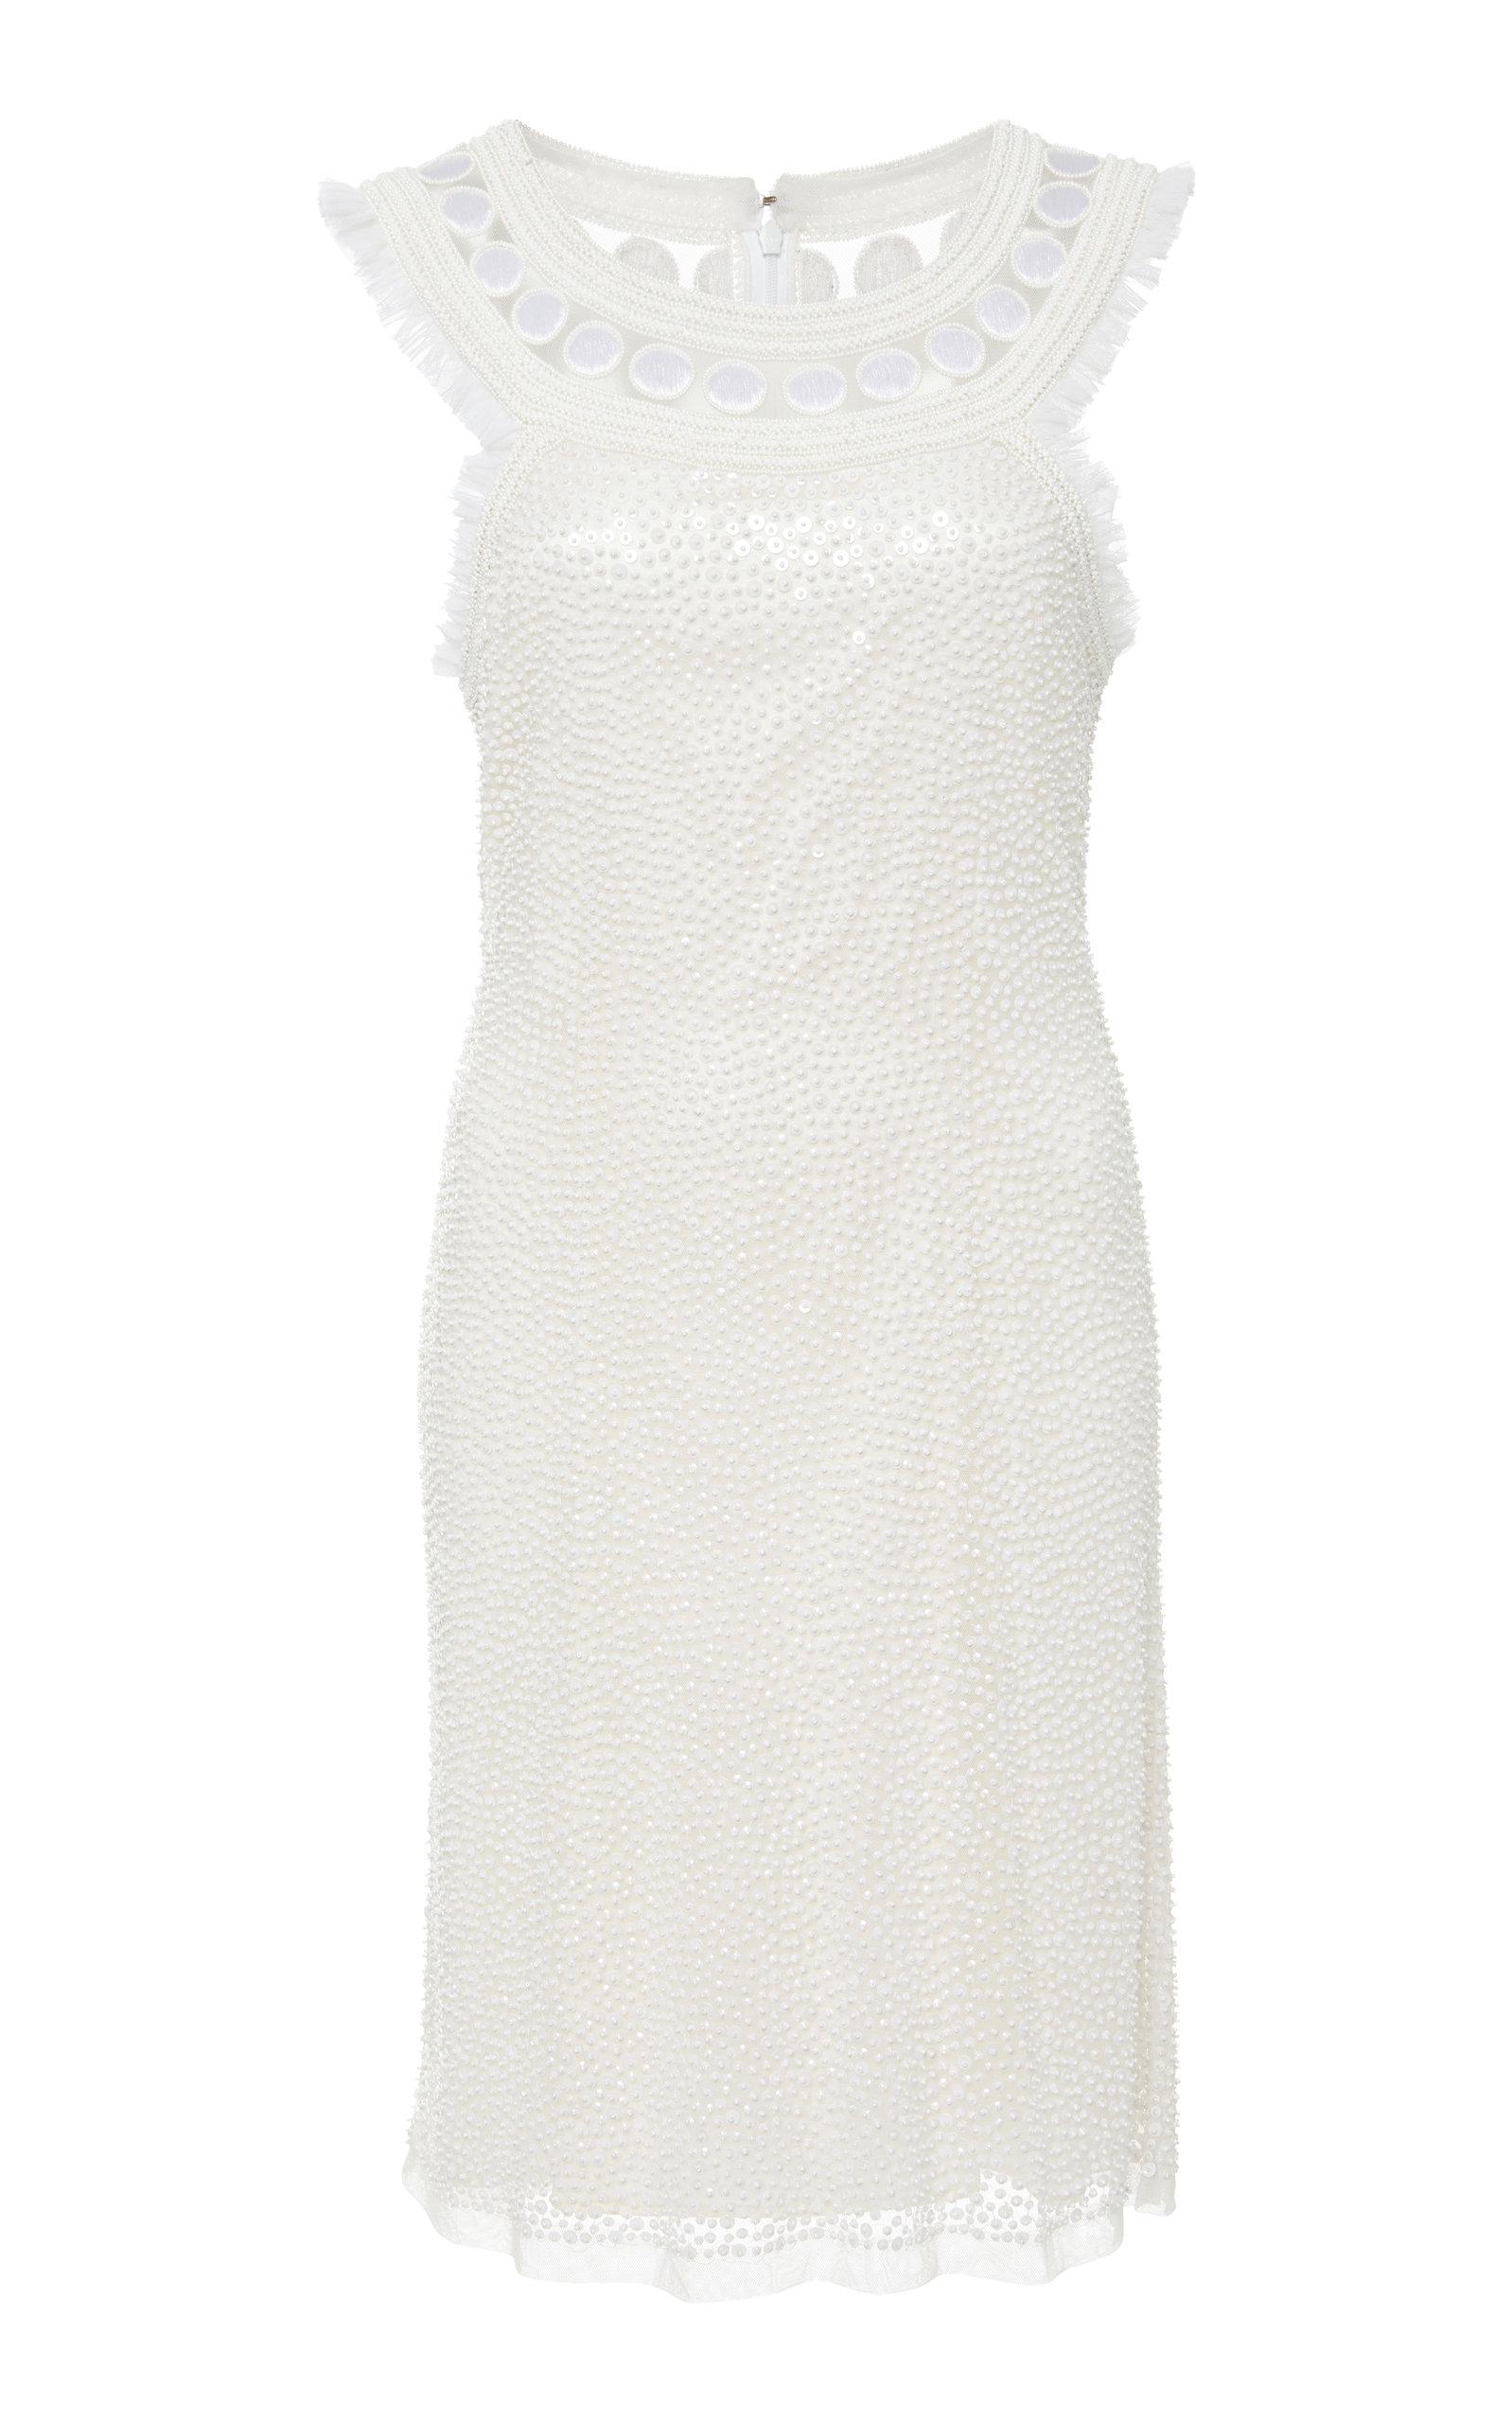 JOANNA MASTROIANNI YOKE EMBROIDERED SHEATH DRESS